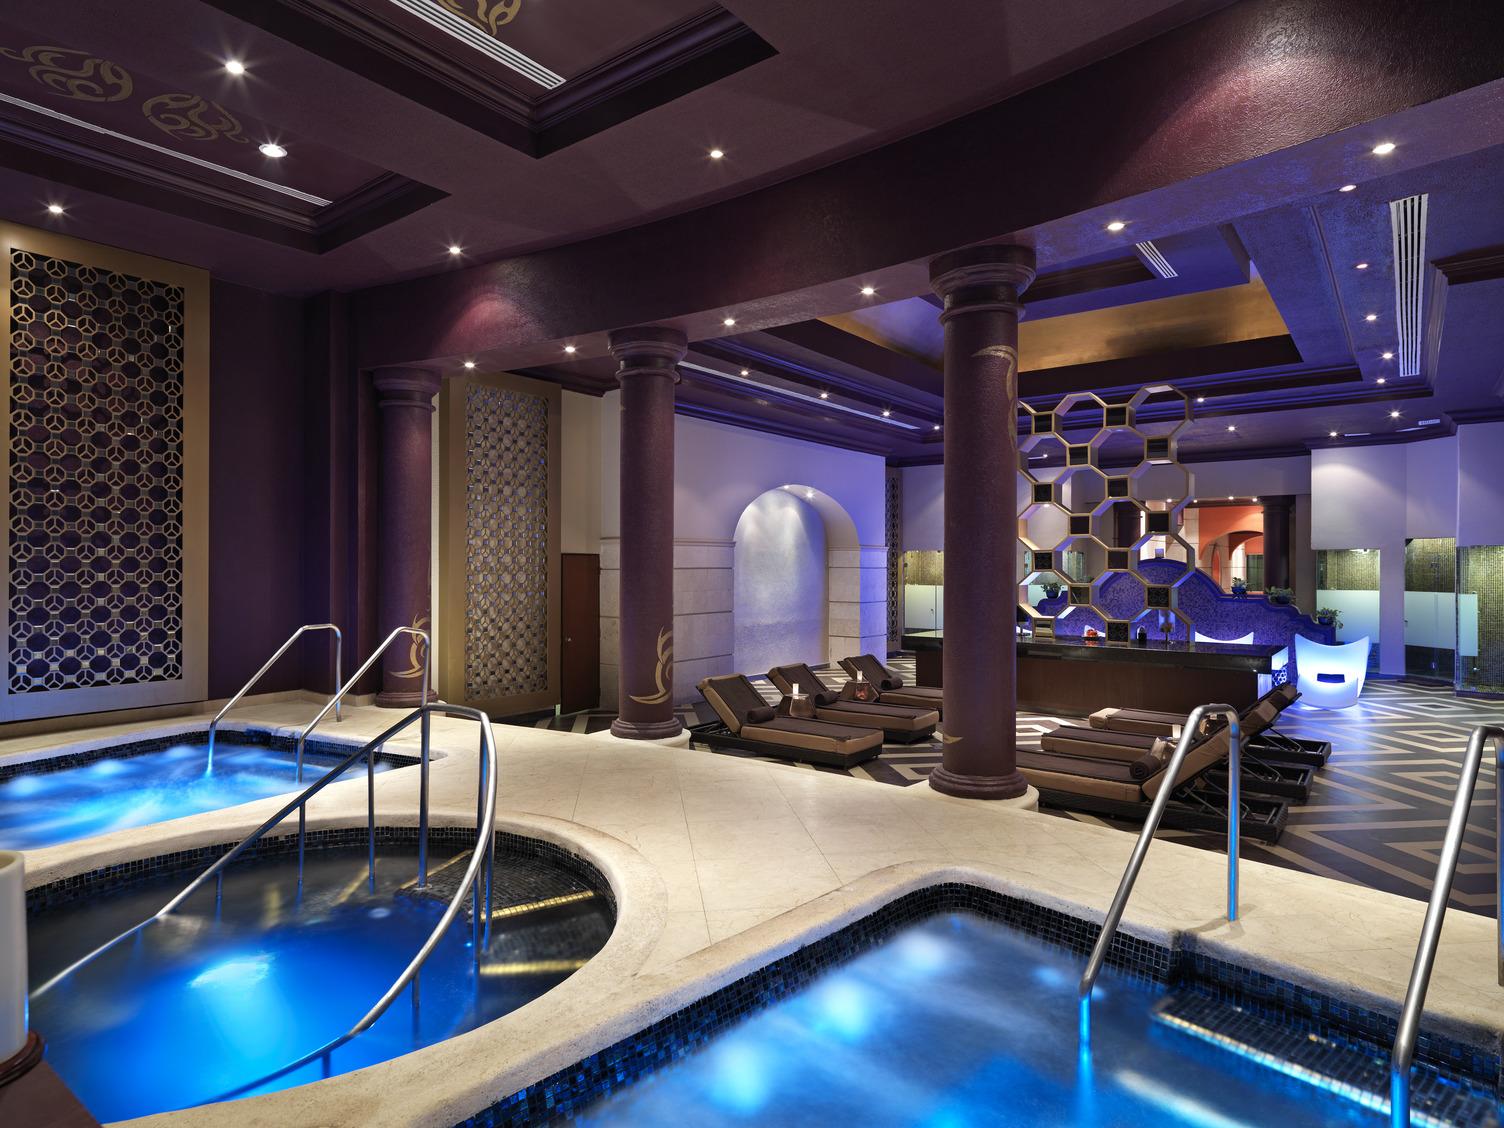 Travel Agency All-Inclusive Resort Heaven at Hard Rock Hotel Riviera Maya 62